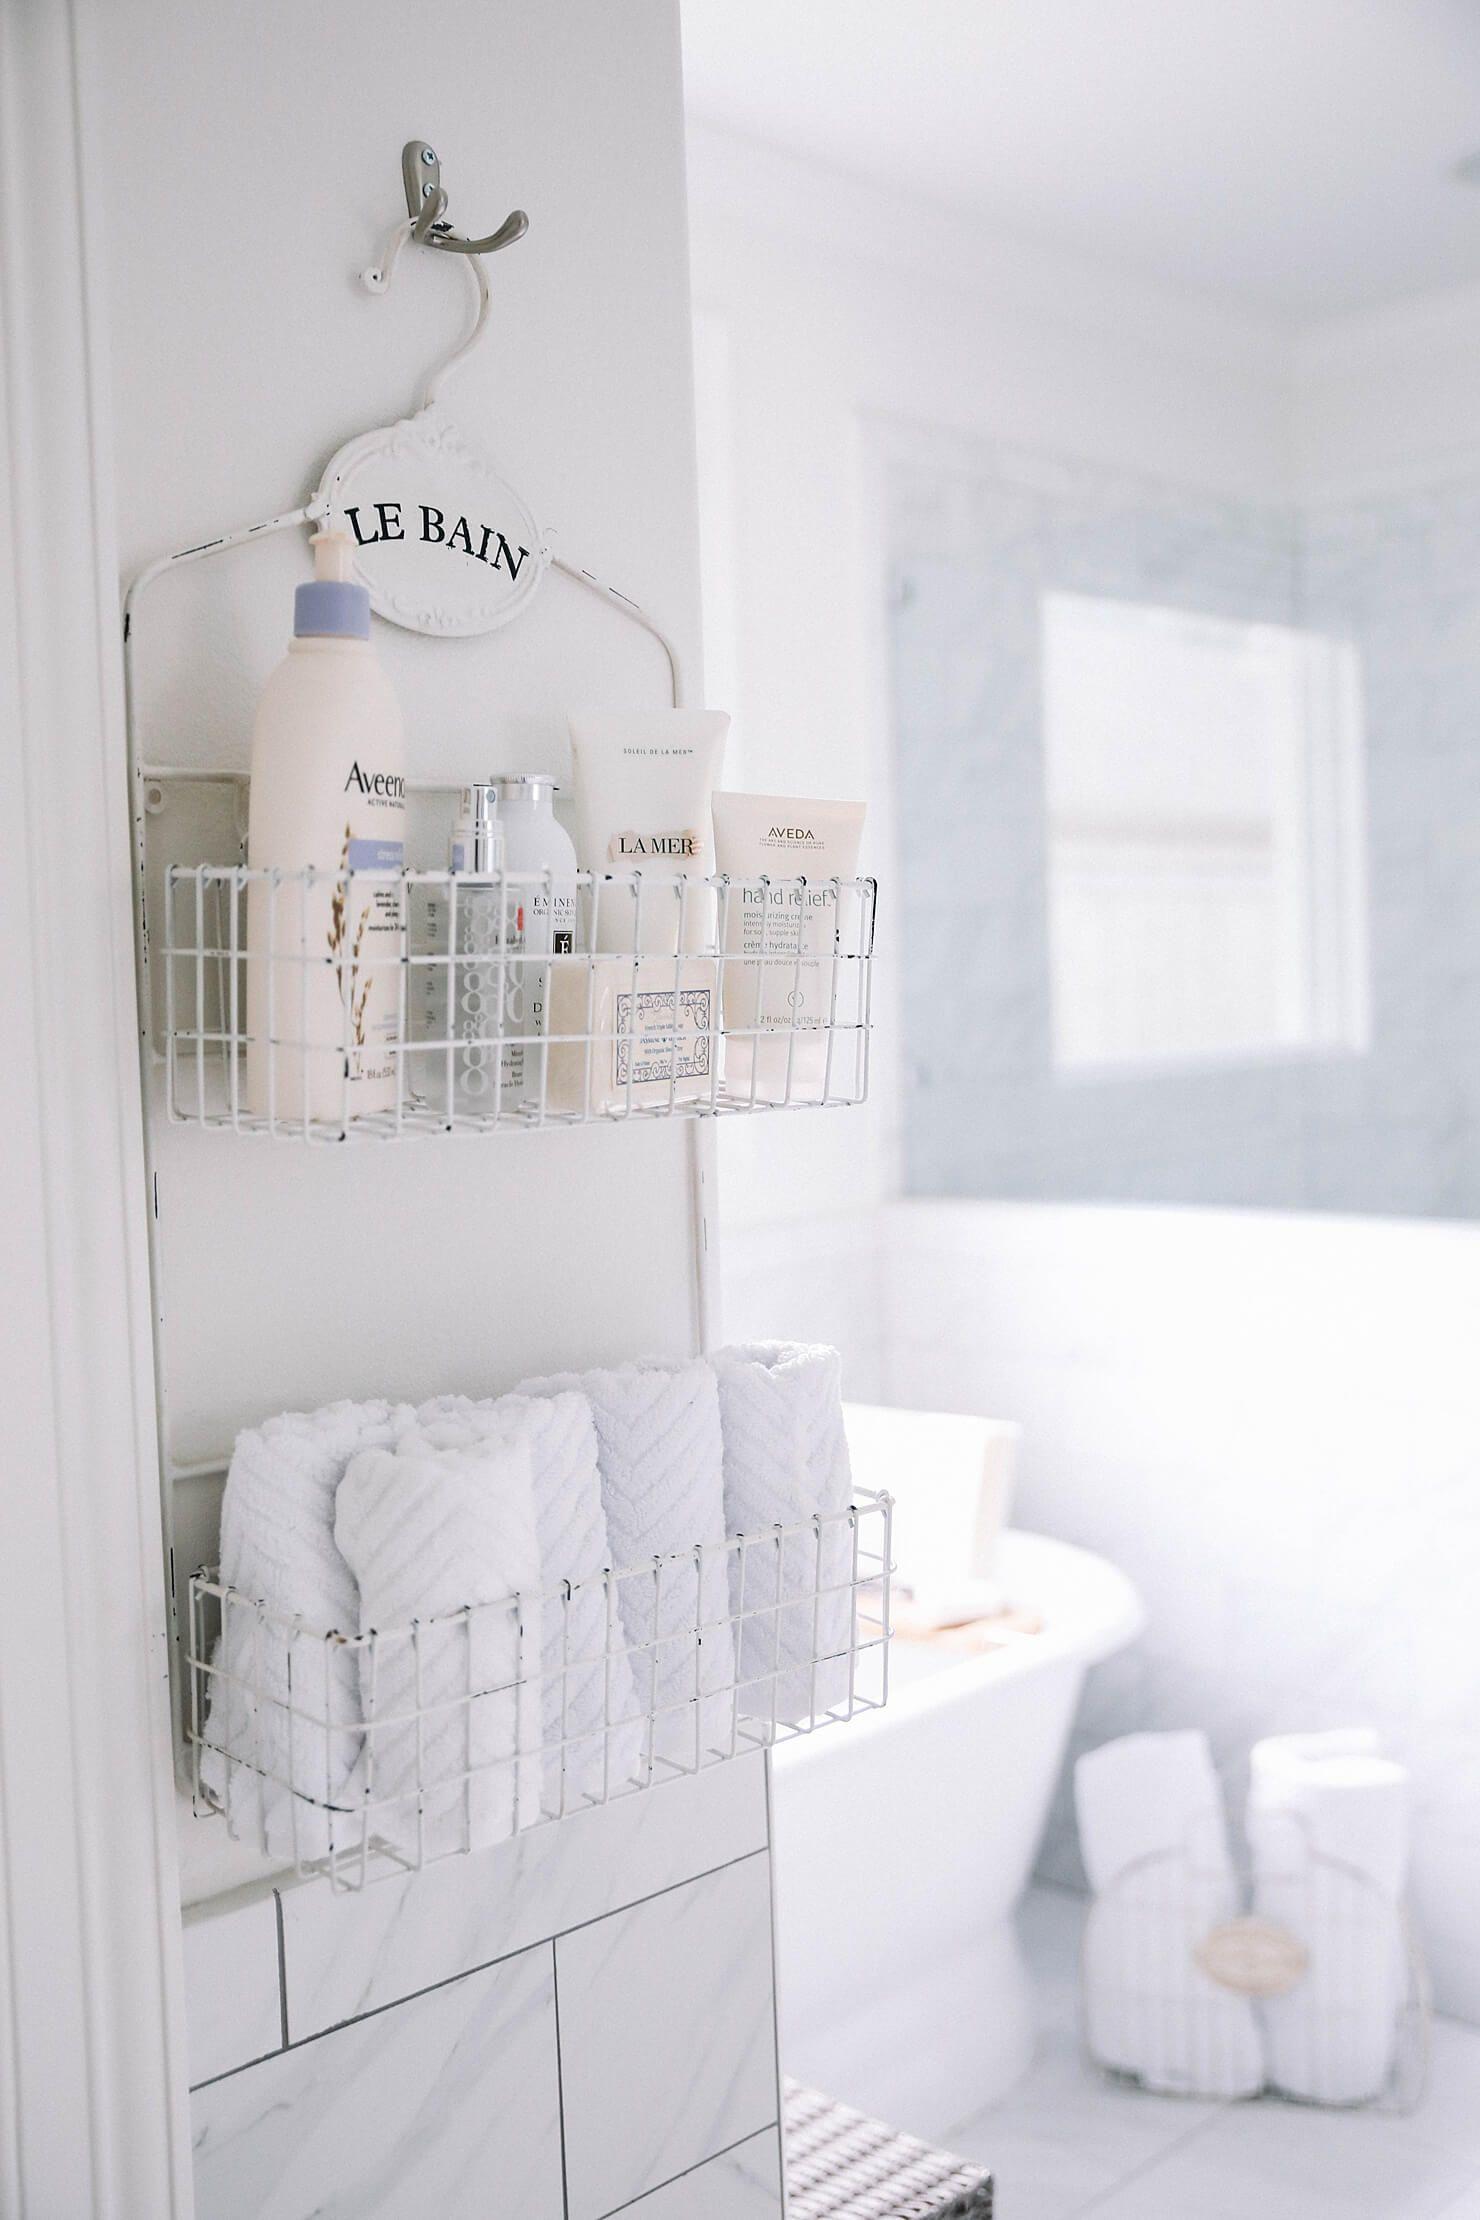 Bathroom Organization Ideas: 6 Tips to Keeping Your Bathroom Tidy ...